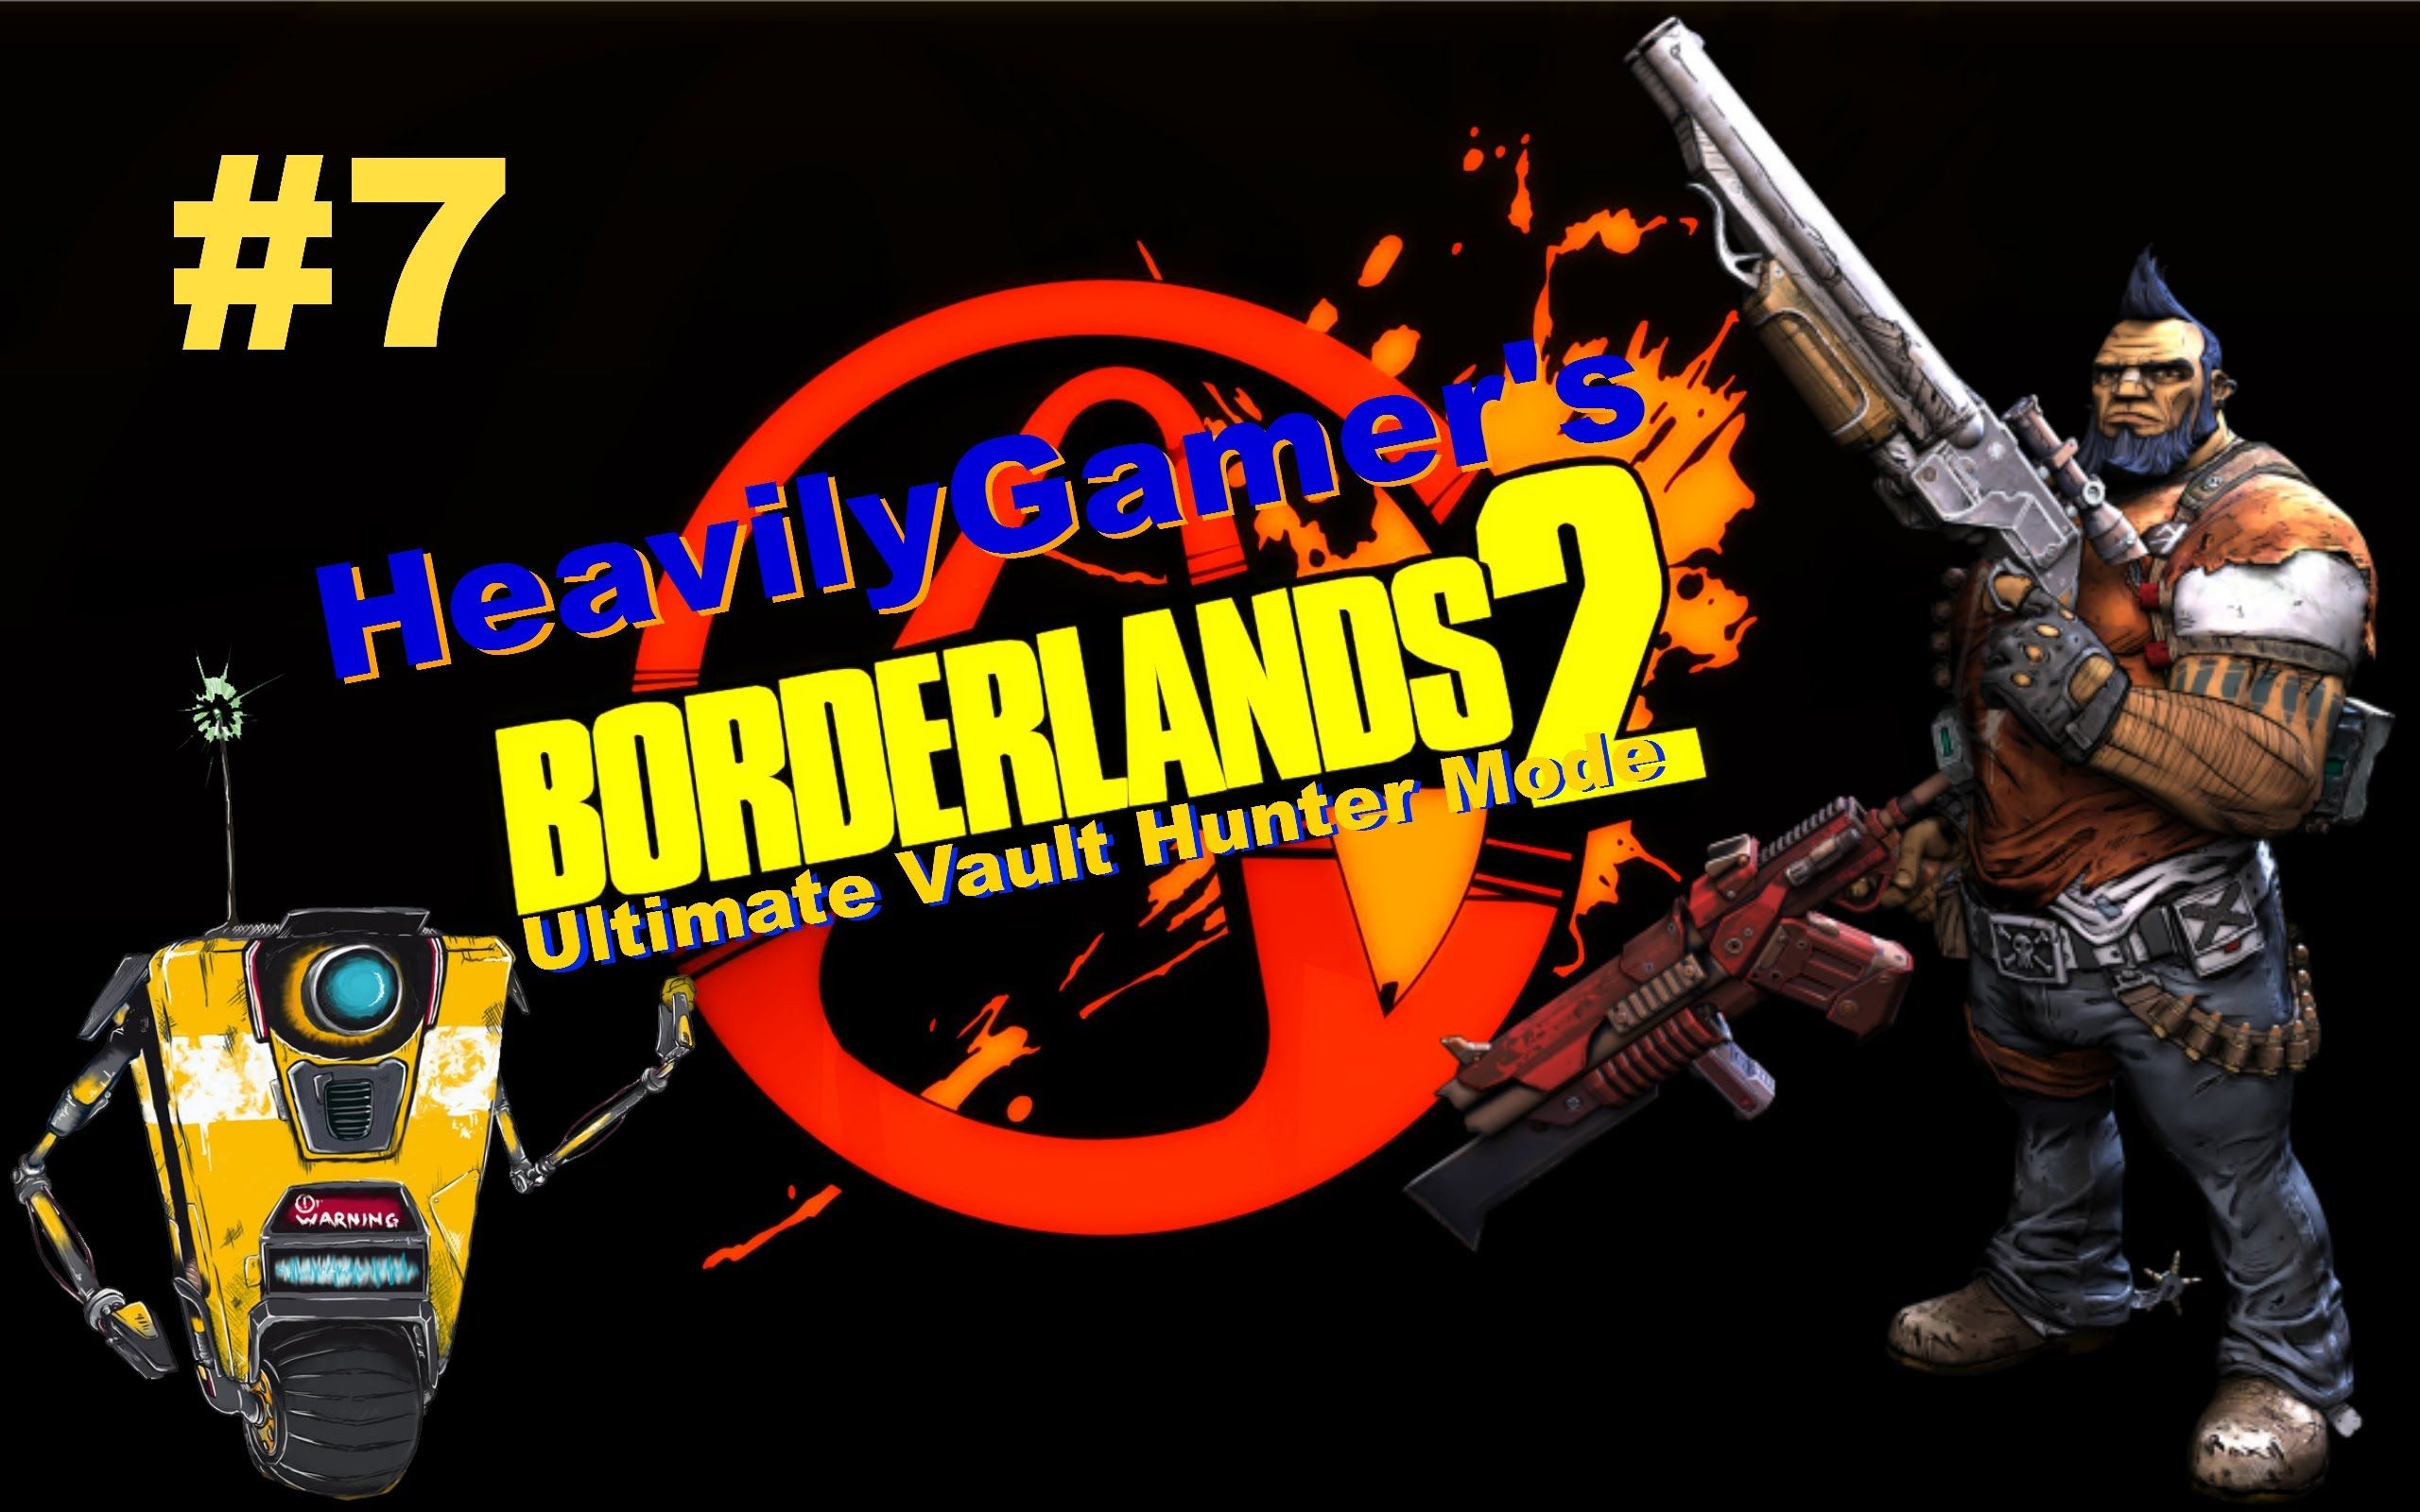 Borderlands 2 Ultimate Vault Hunter Mode Part 7:Medical Mystery,No Vacan...